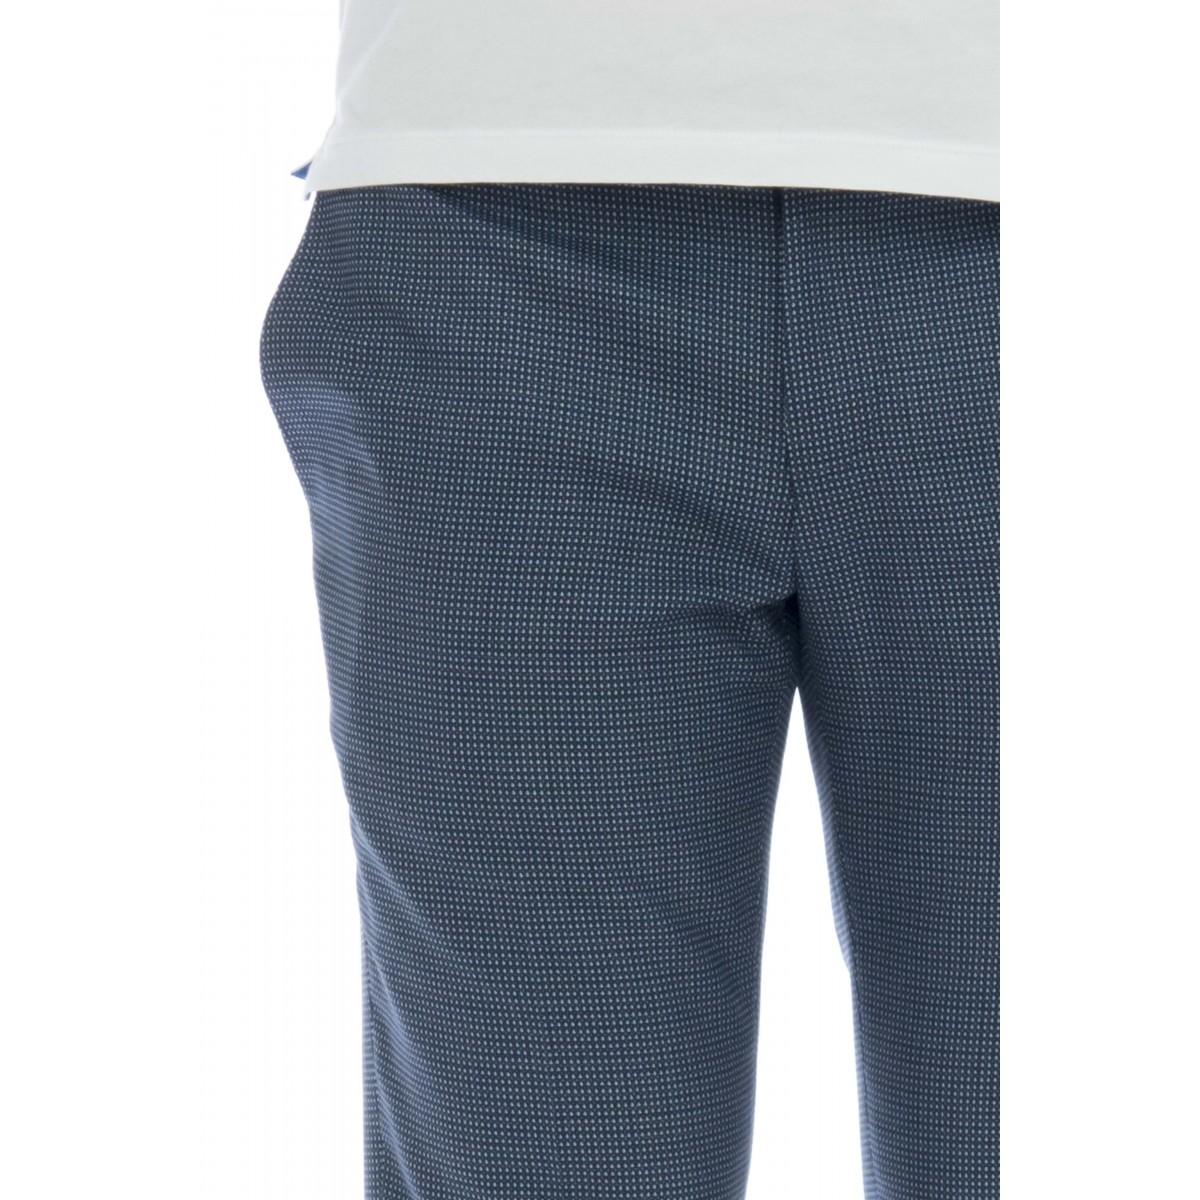 Pantalone uomo - Ds01z tc32 lana cotone strech